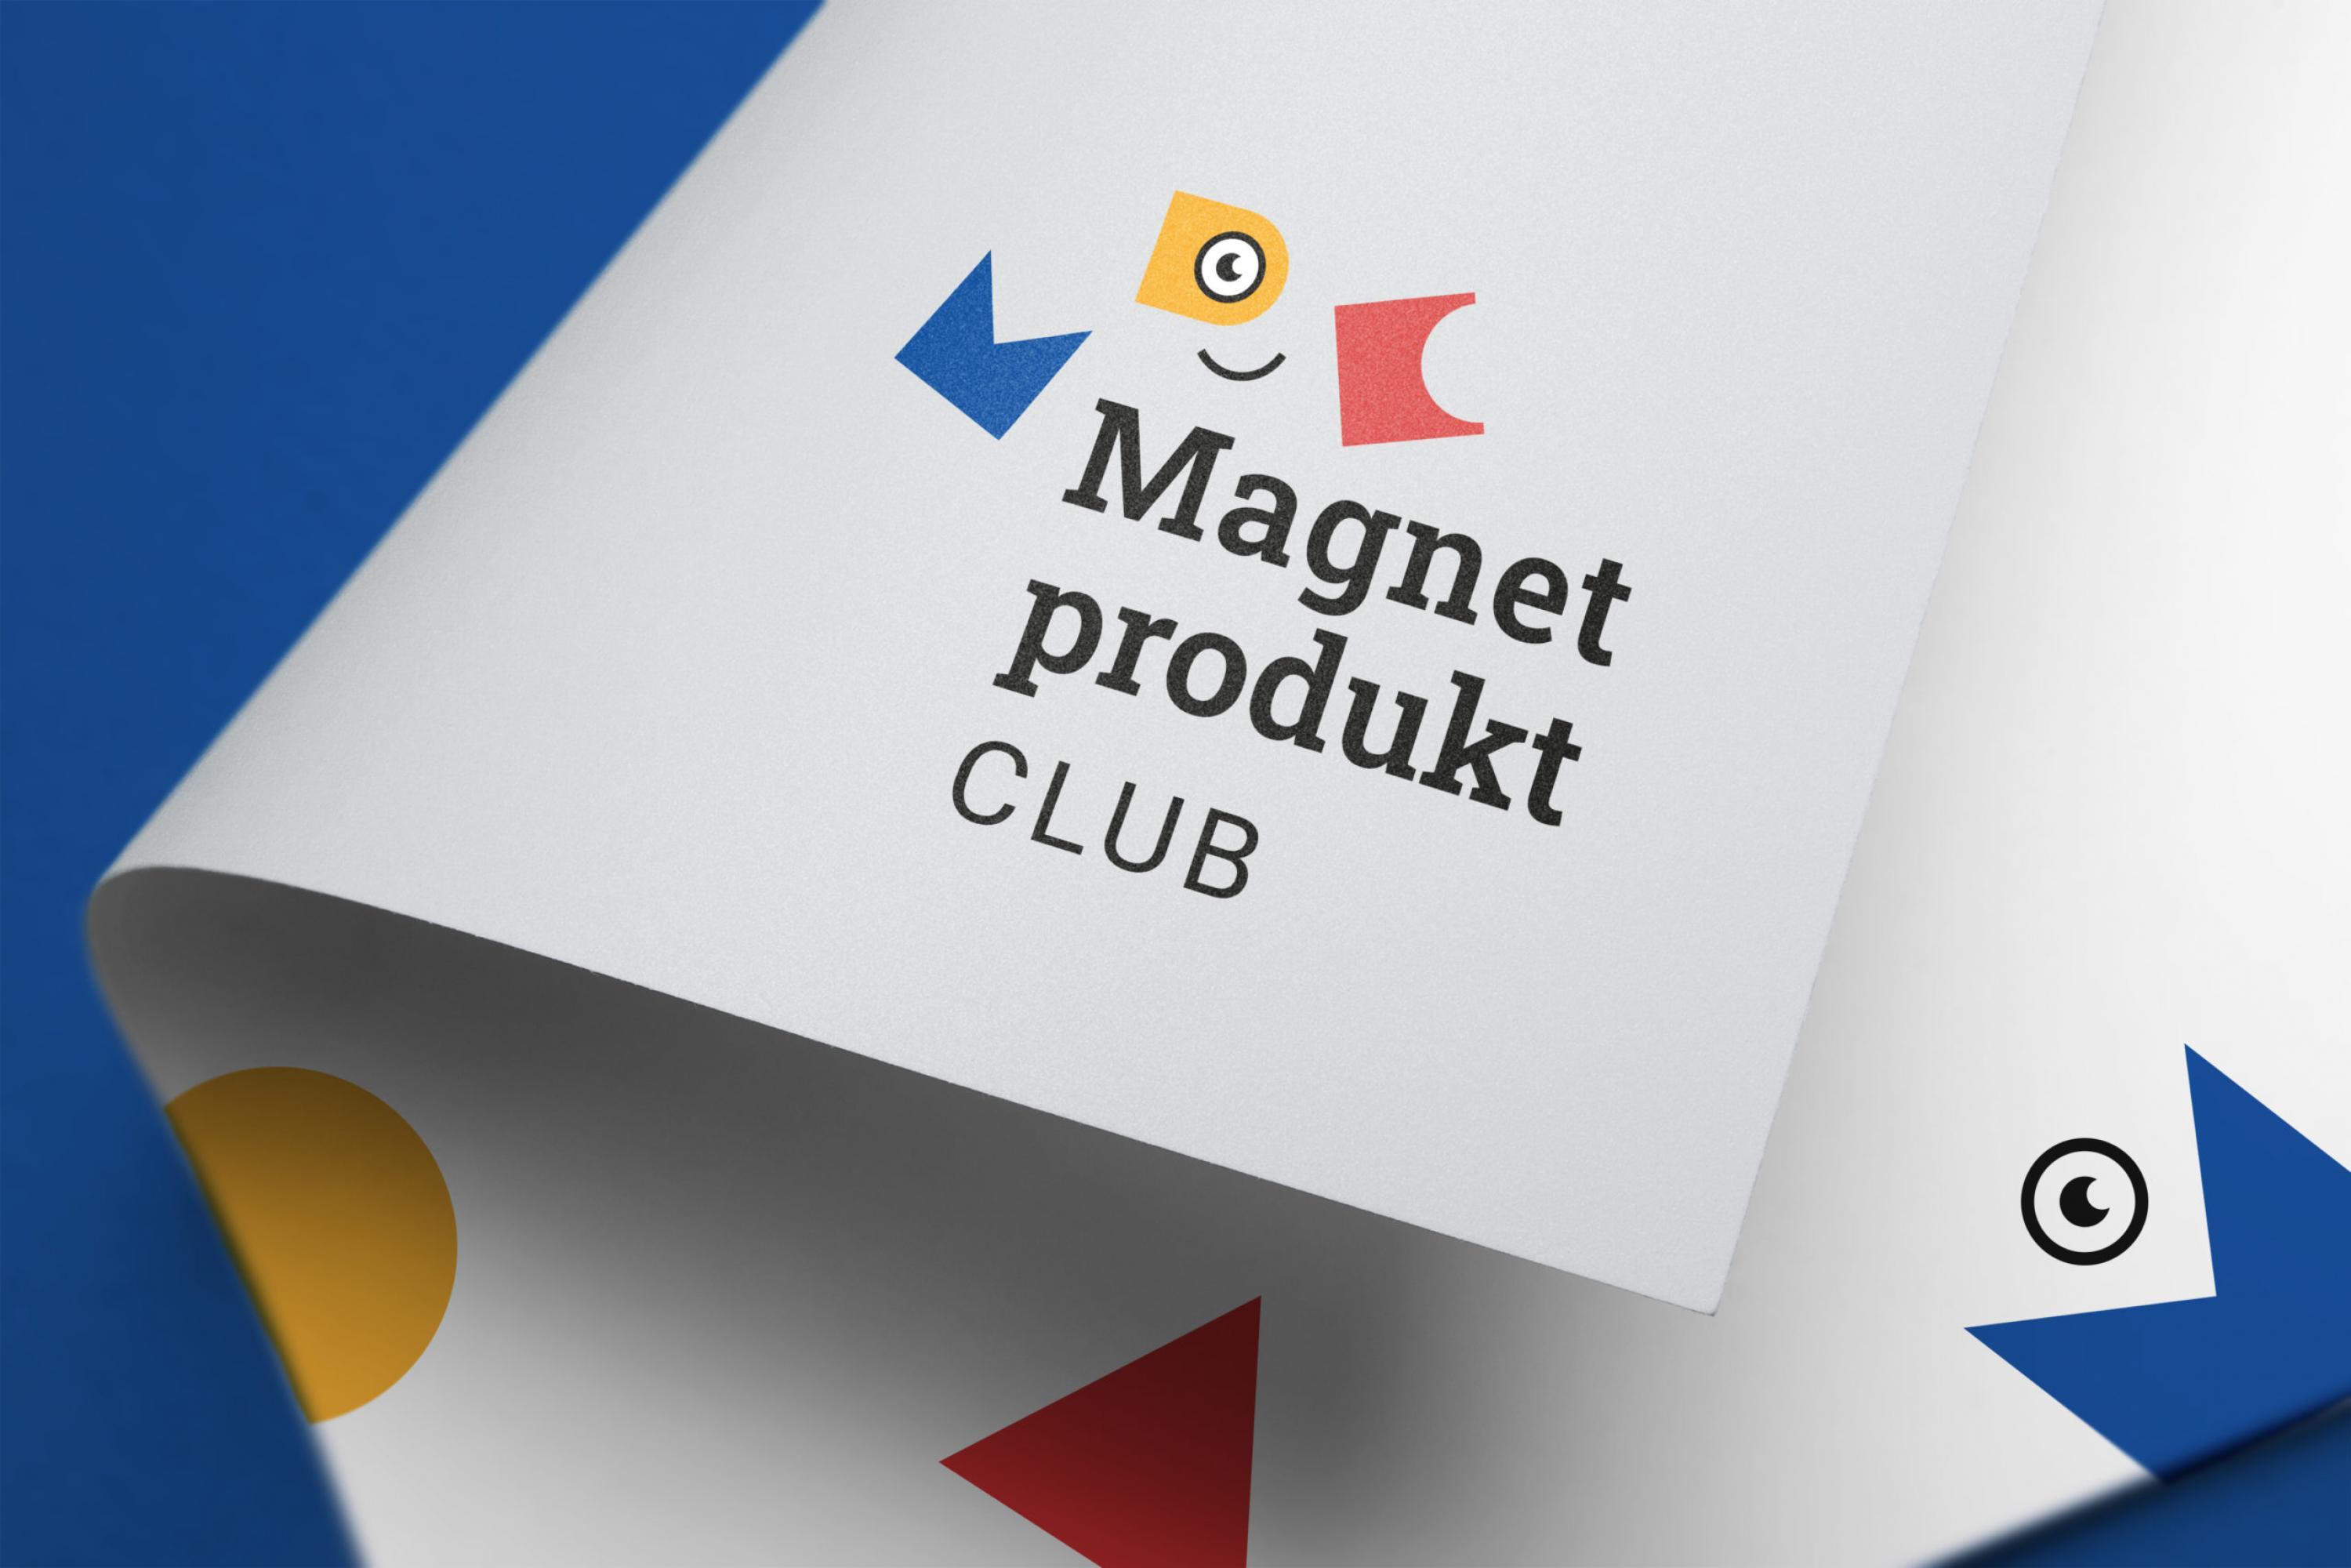 Magnetprodukt-Club-Branding-Logo-Entwicklung-FORMLOS-Berlin-Gestaltung-Design